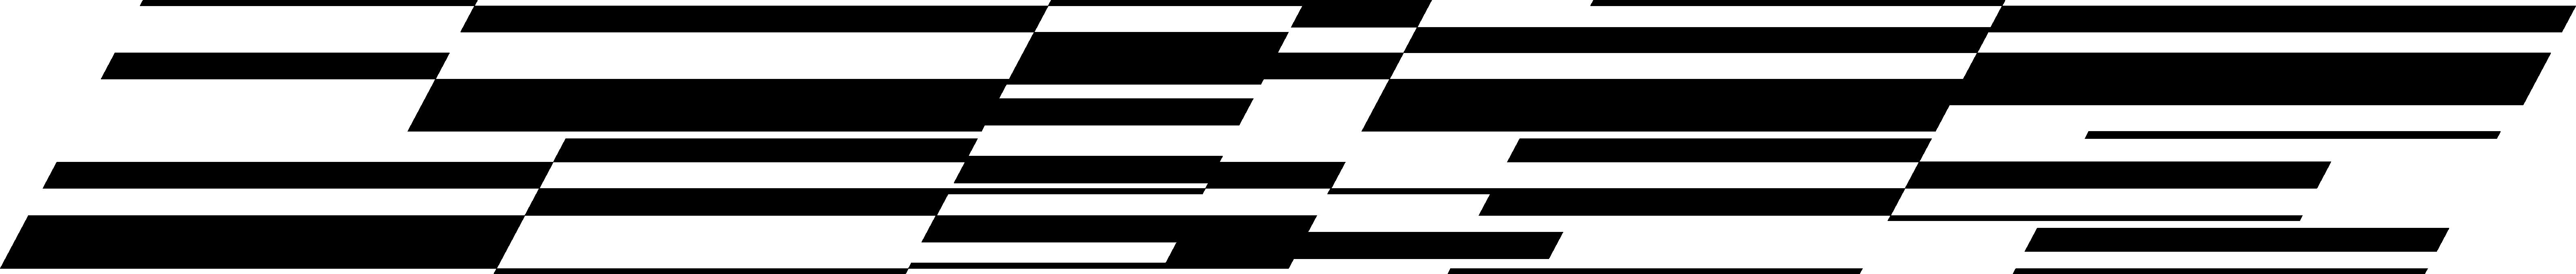 Elemento Gráfico Power Racing